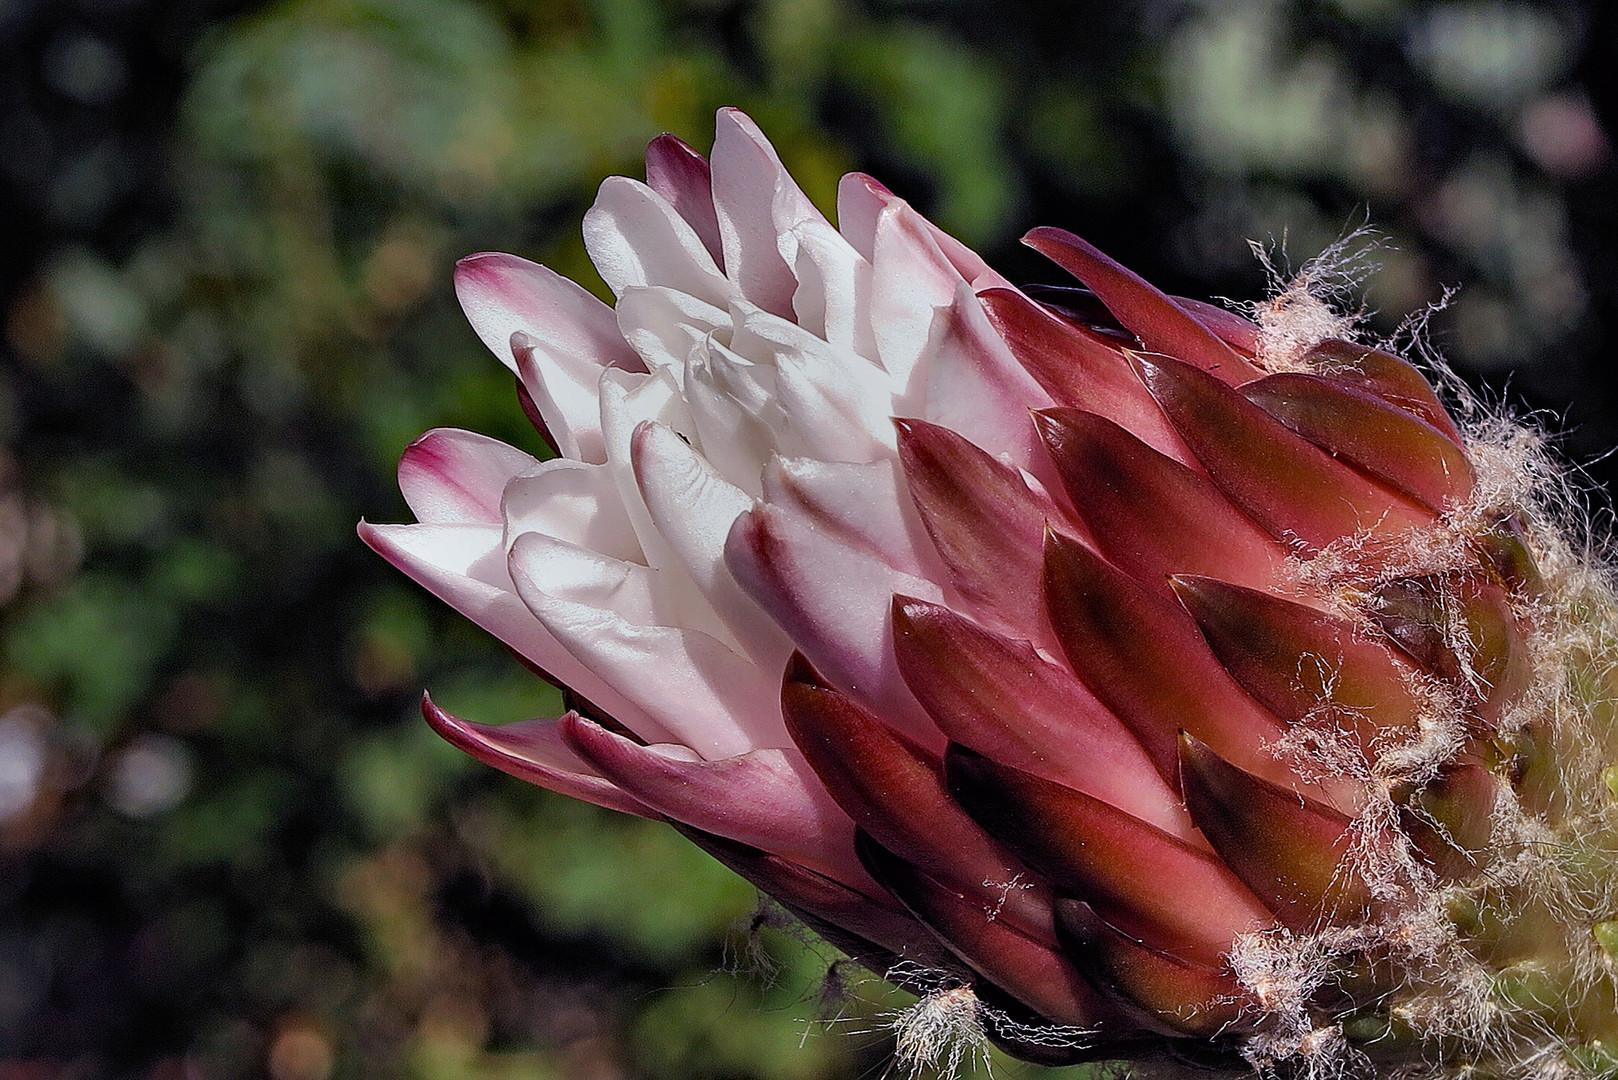 Hairy Cactus Flower Bud 1